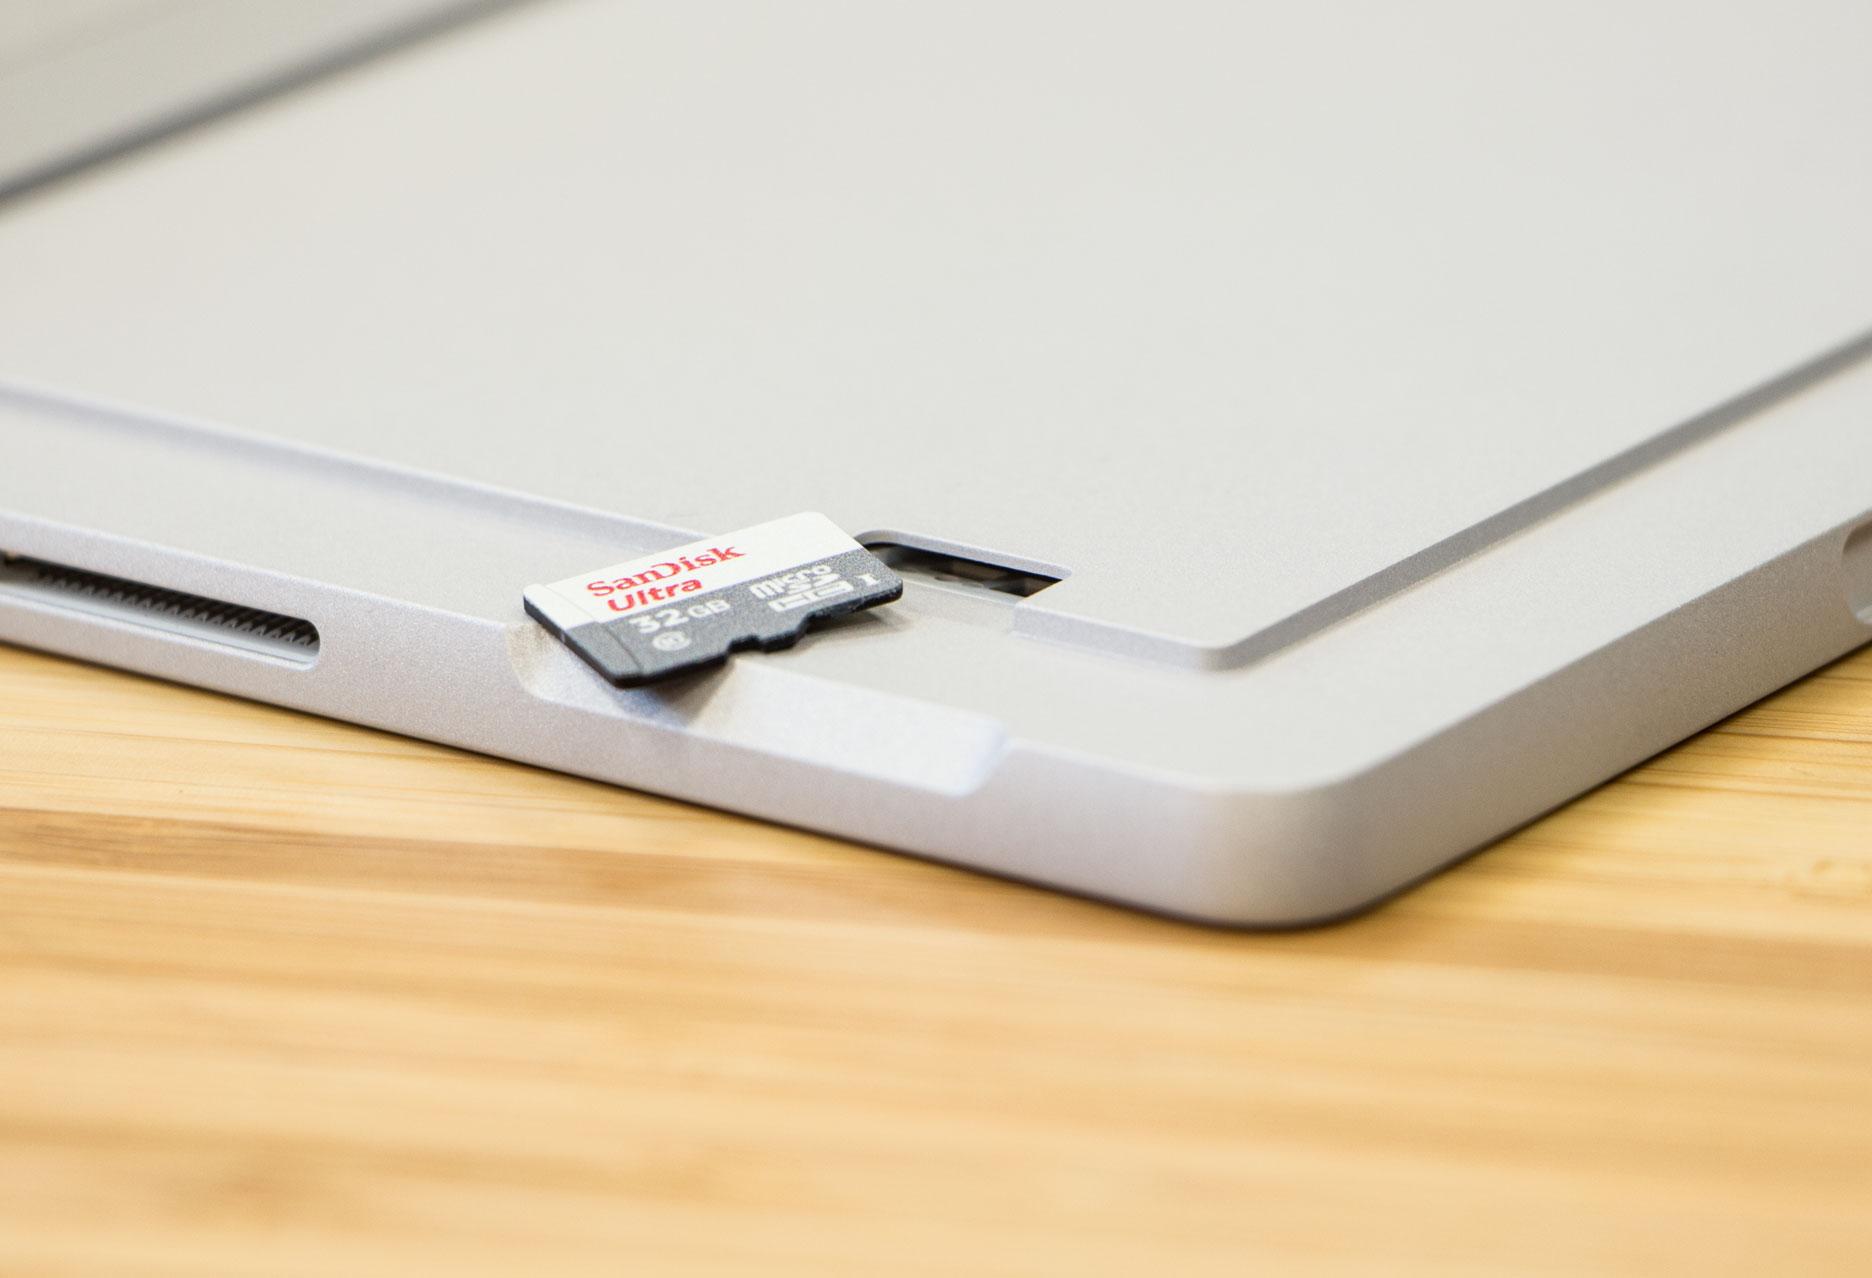 Microsoft Surface Pro czytnik kart pamięci